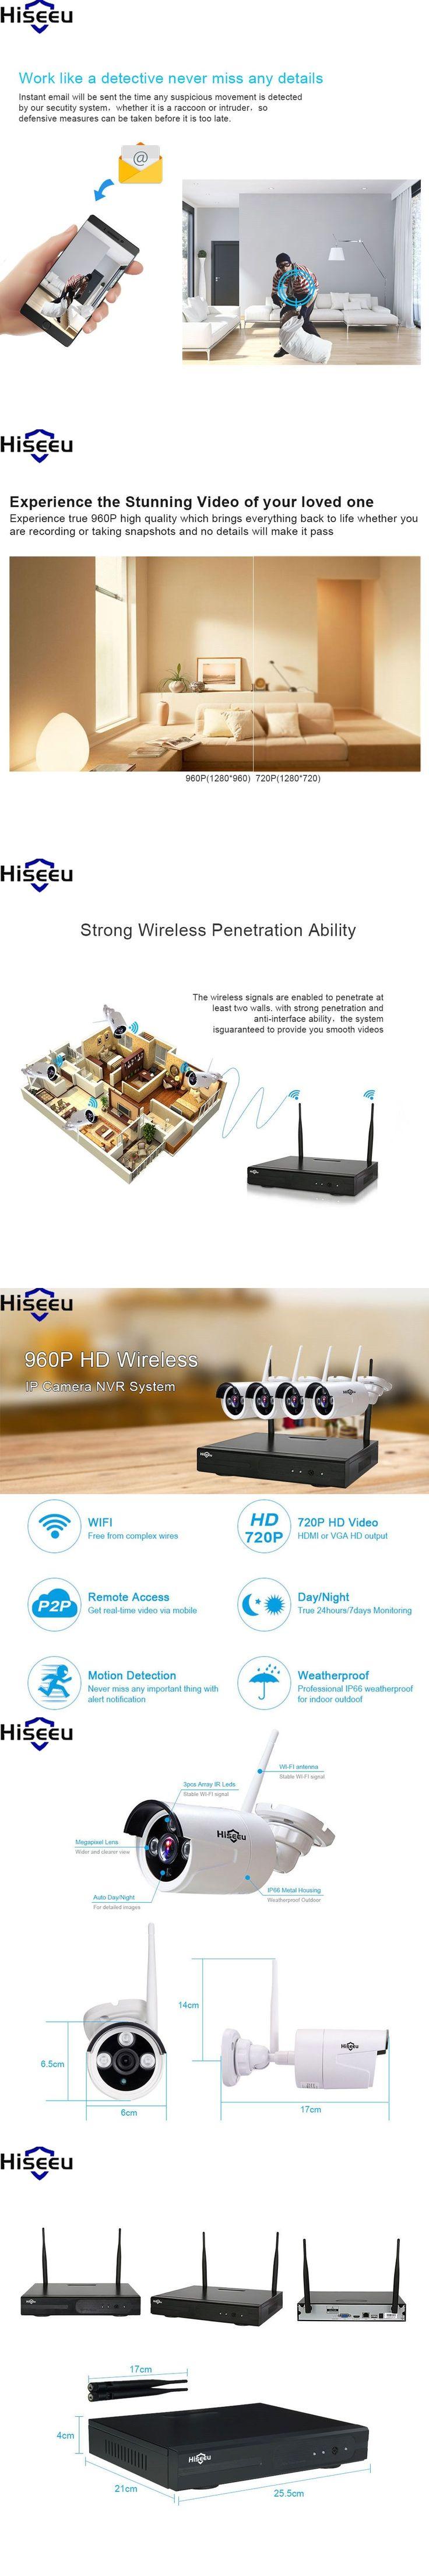 Hiseeu 4ch Powerful wifi NVR Wireless NVR IP Camera 960P Wireless CCTV System CCTV Camera Home Security System Surveillance Kit #homesurveillancecameras